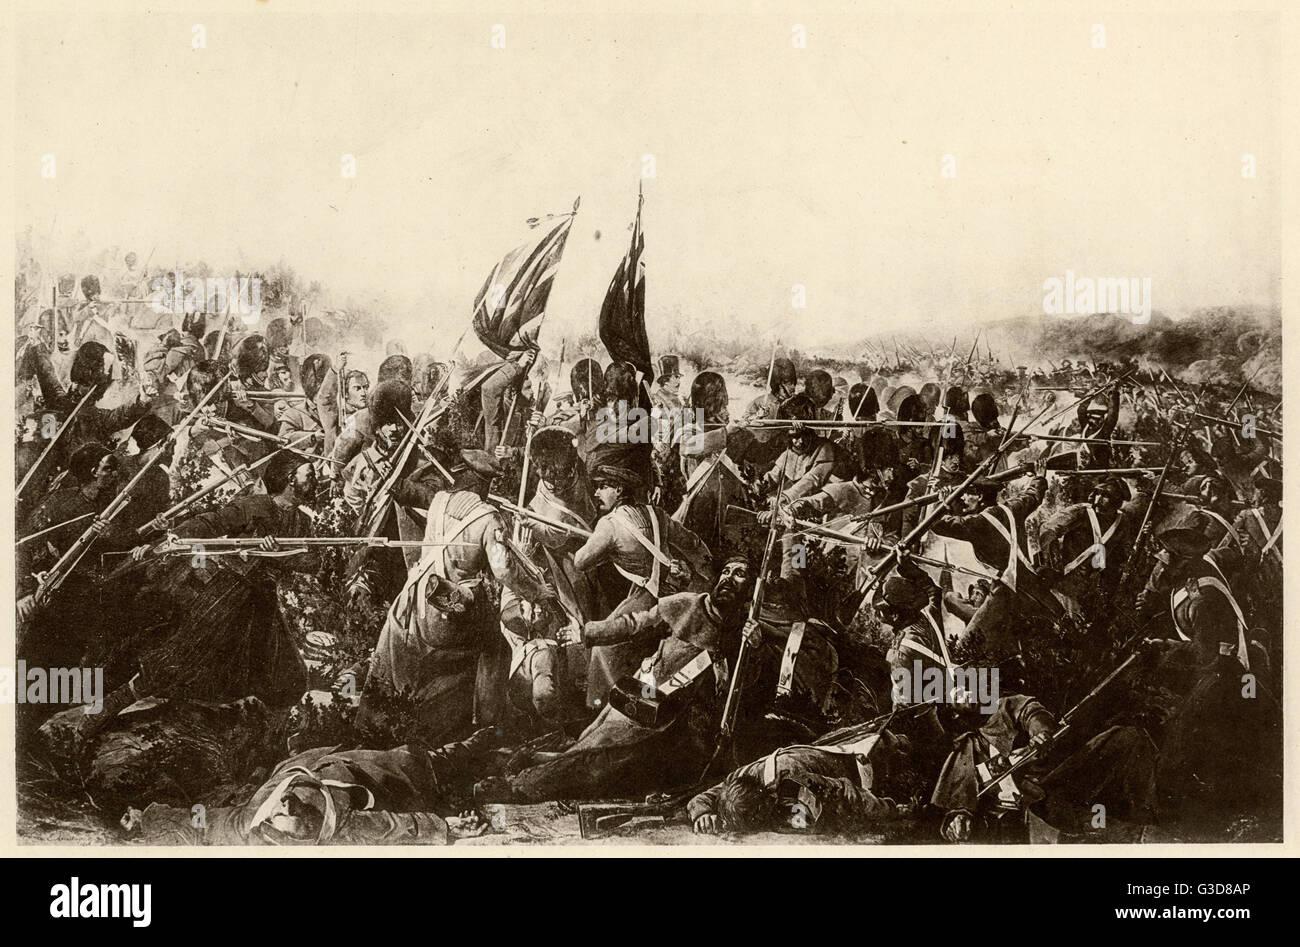 Battle of Inkerman during the Crimean War.     Date: 5th November 1854 - Stock Image